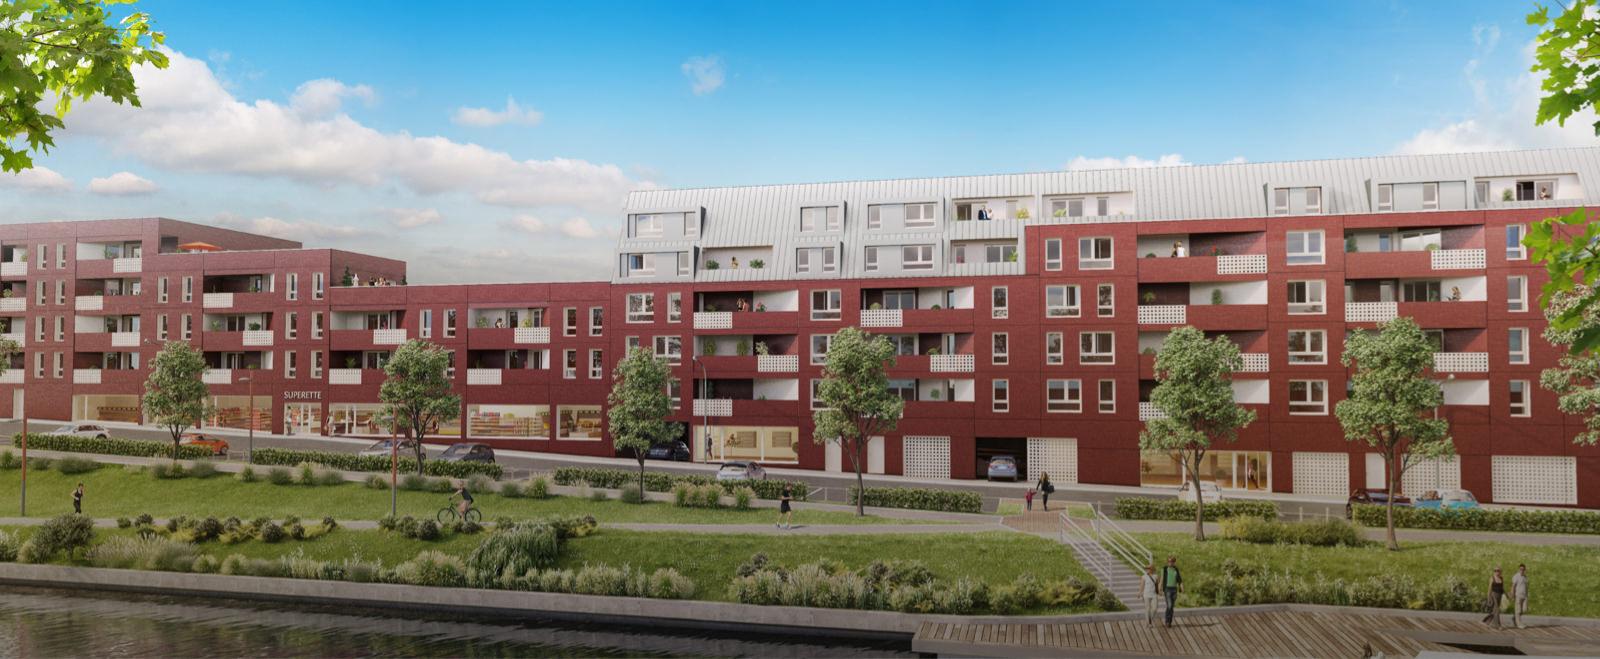 R sidence es ko achat appartement neuf valenciennes for Achat appartement neuf defiscalisation